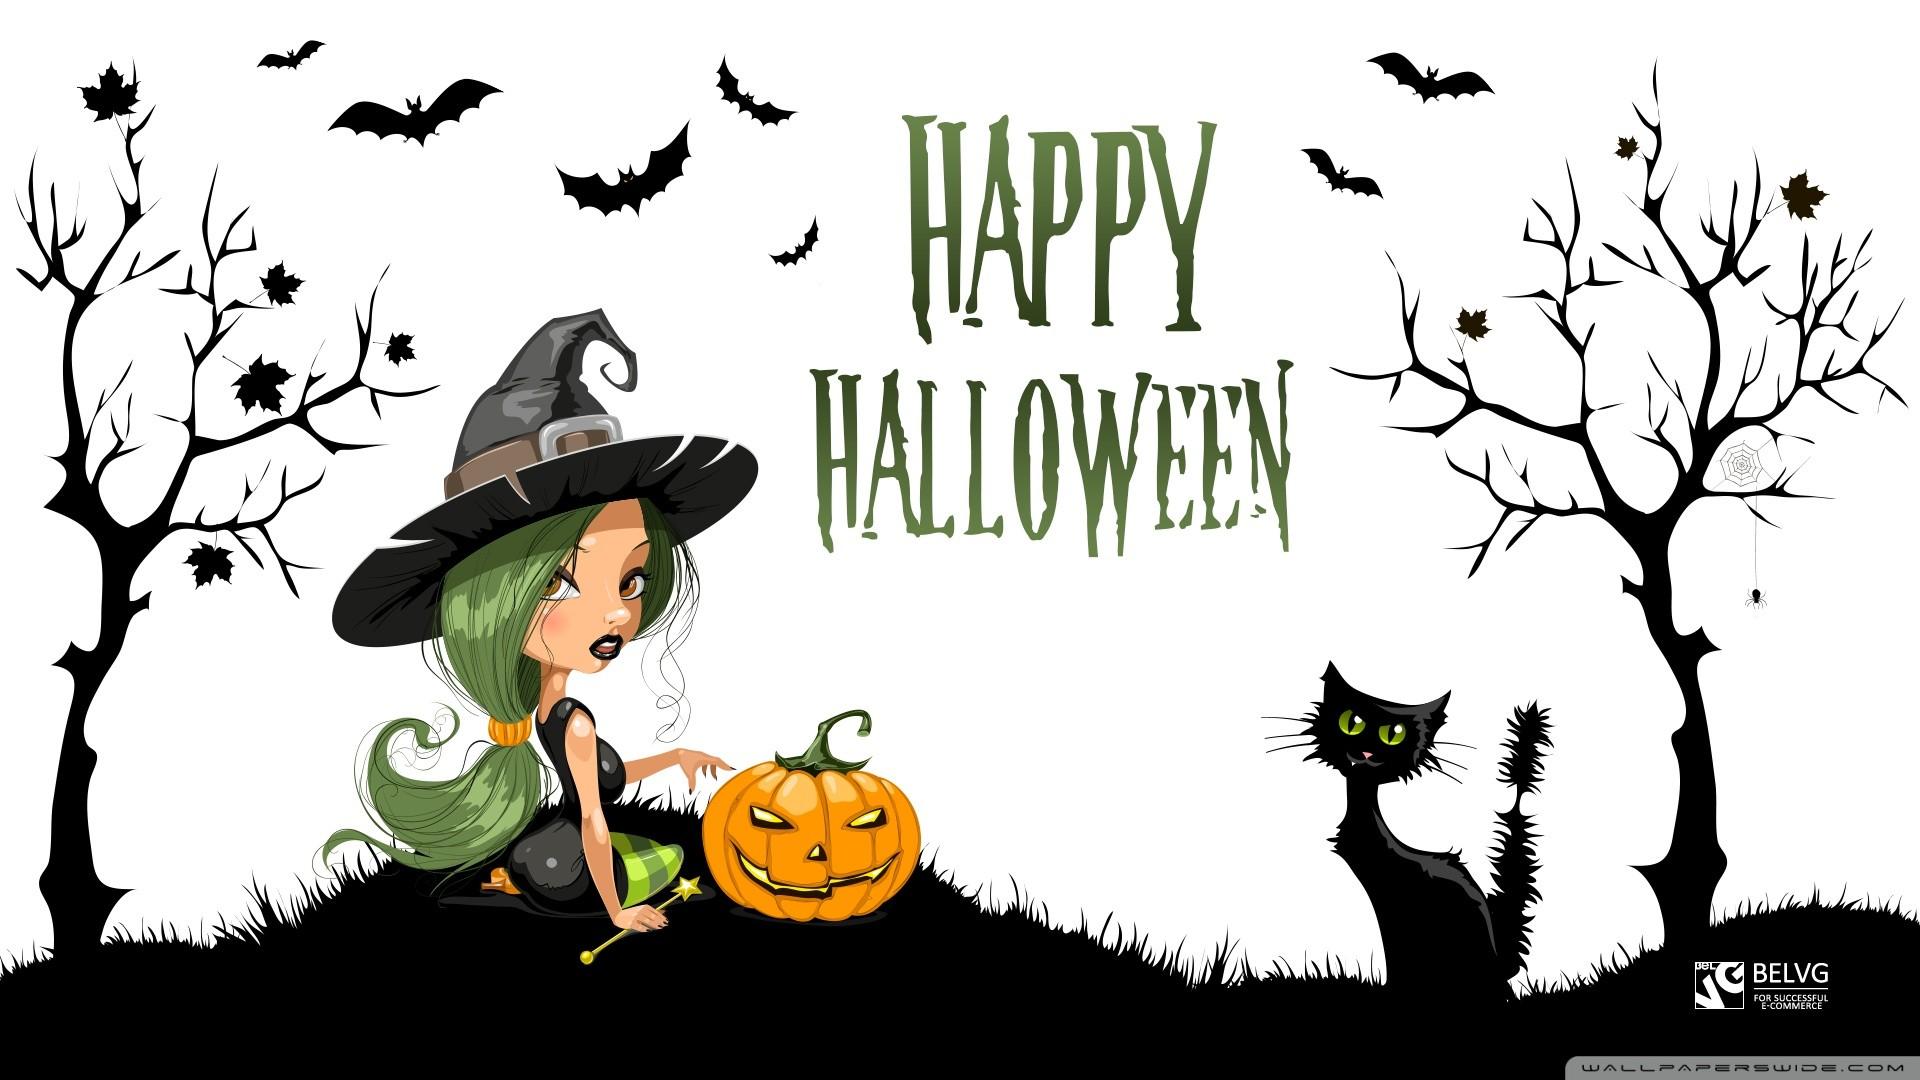 Sexy Witch on Halloween HD desktop wallpaper : High Definition … Sexy  Witch On Halloween HD Desktop Wallpaper High Definition